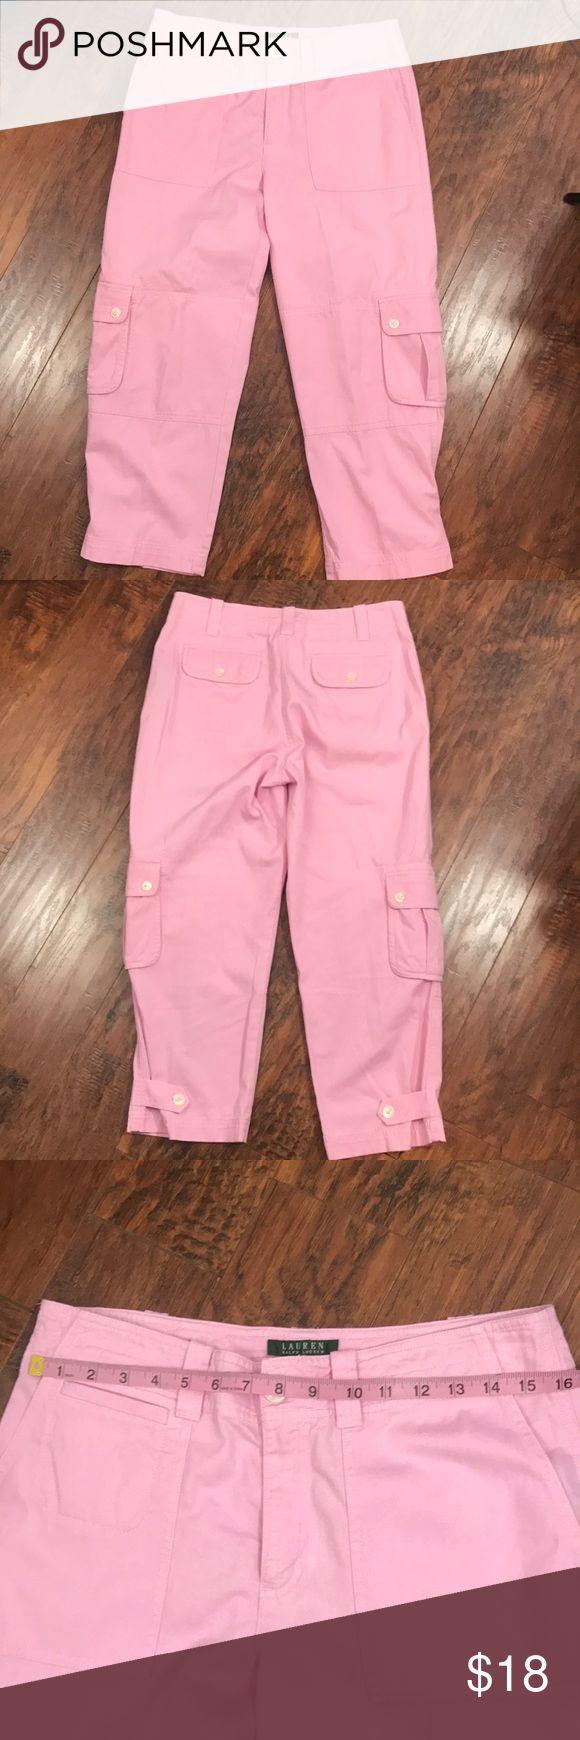 Lauren Ralph Lauren Size 8 Pink Capris EUC Cotton/rayon blend  No stains, no rips  O316 Lauren Ralph Lauren Pants Capris